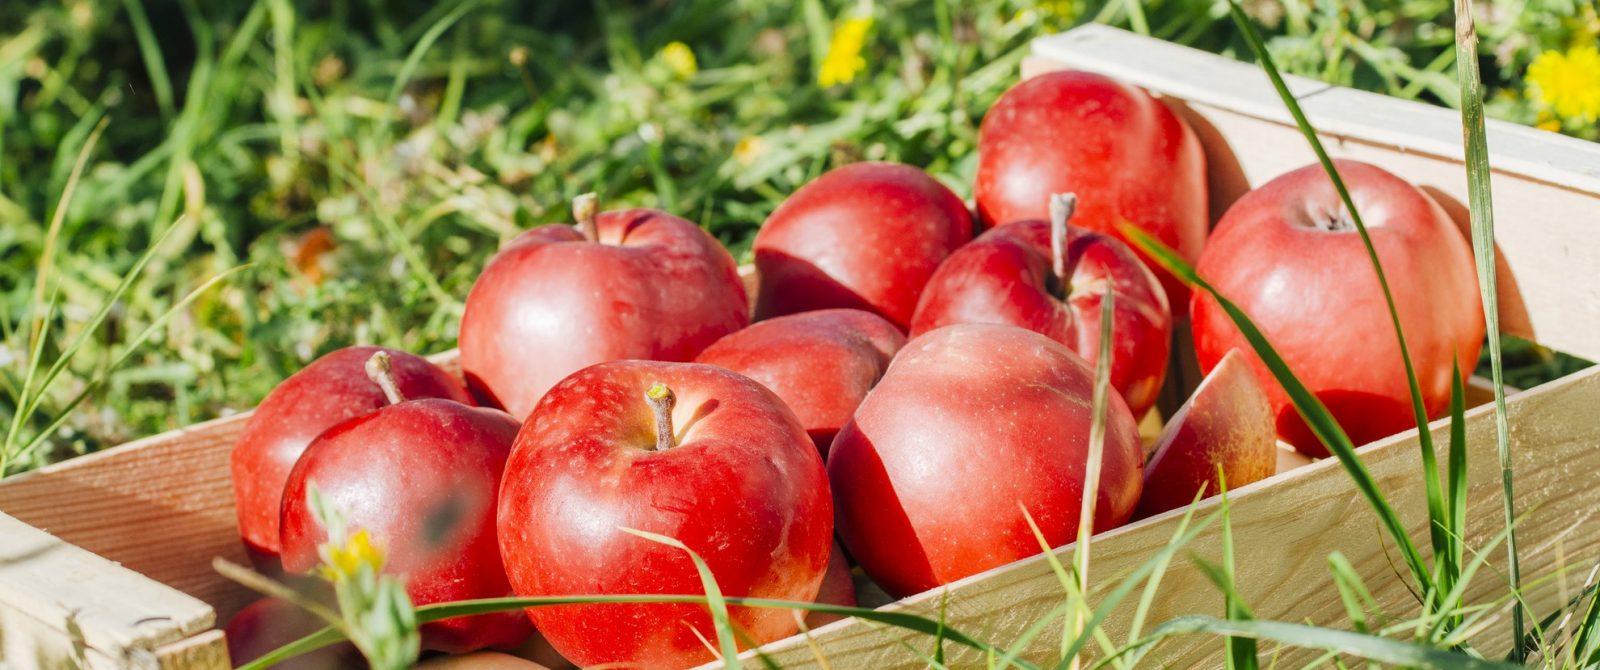 Cagette de pommes ©l-charles-ADT-Aude